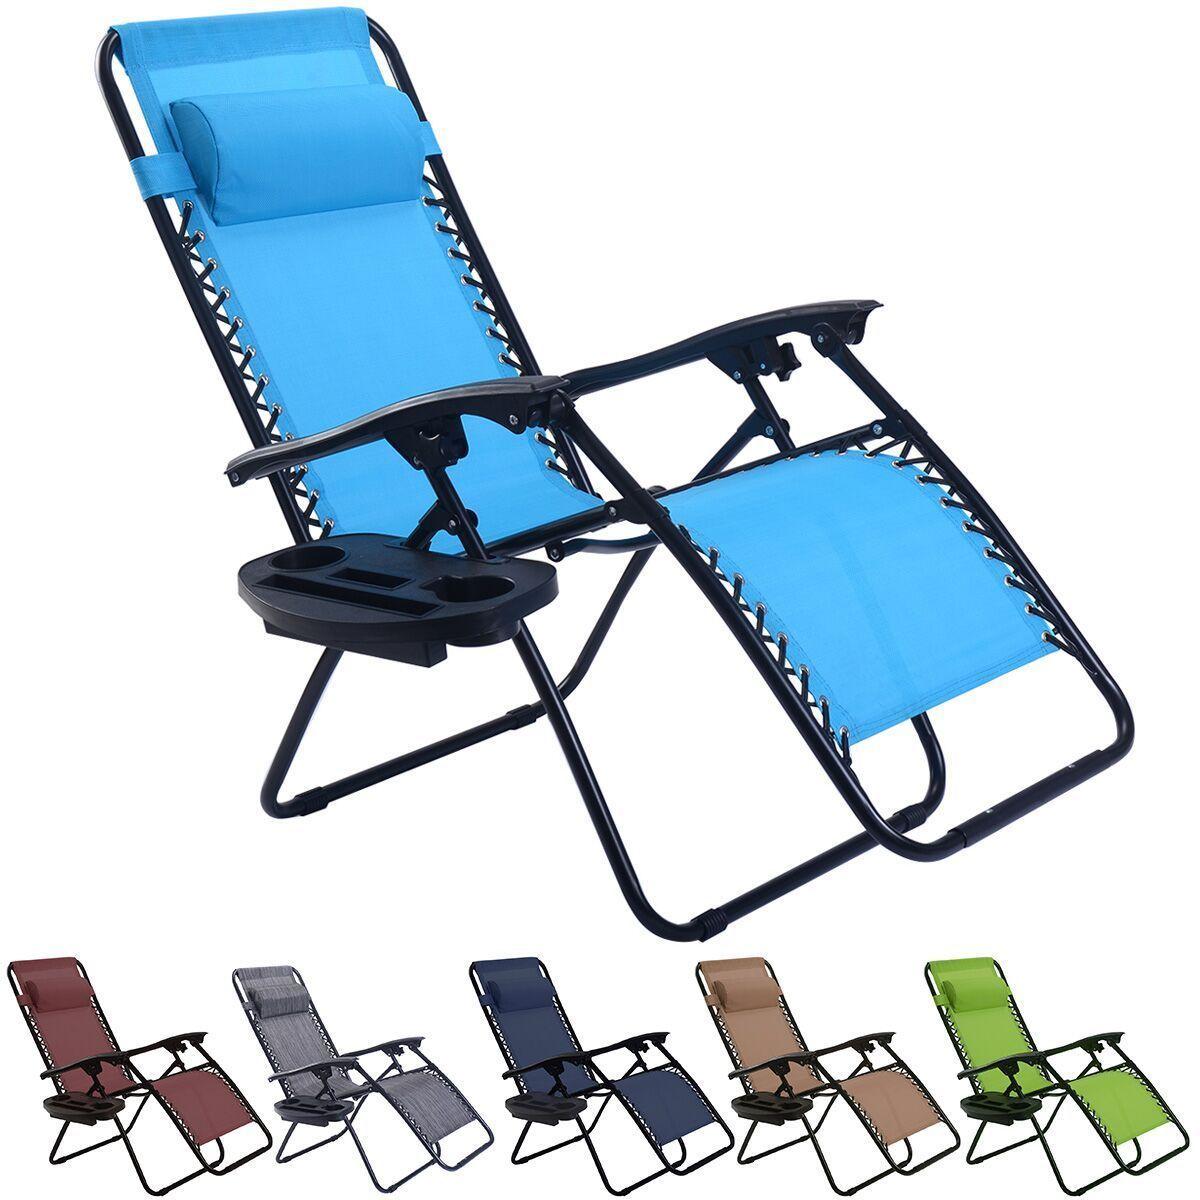 Folding Zero Gravity Reclining Lounge Chairs Outdoor Beach Patio W/Utility  Tray